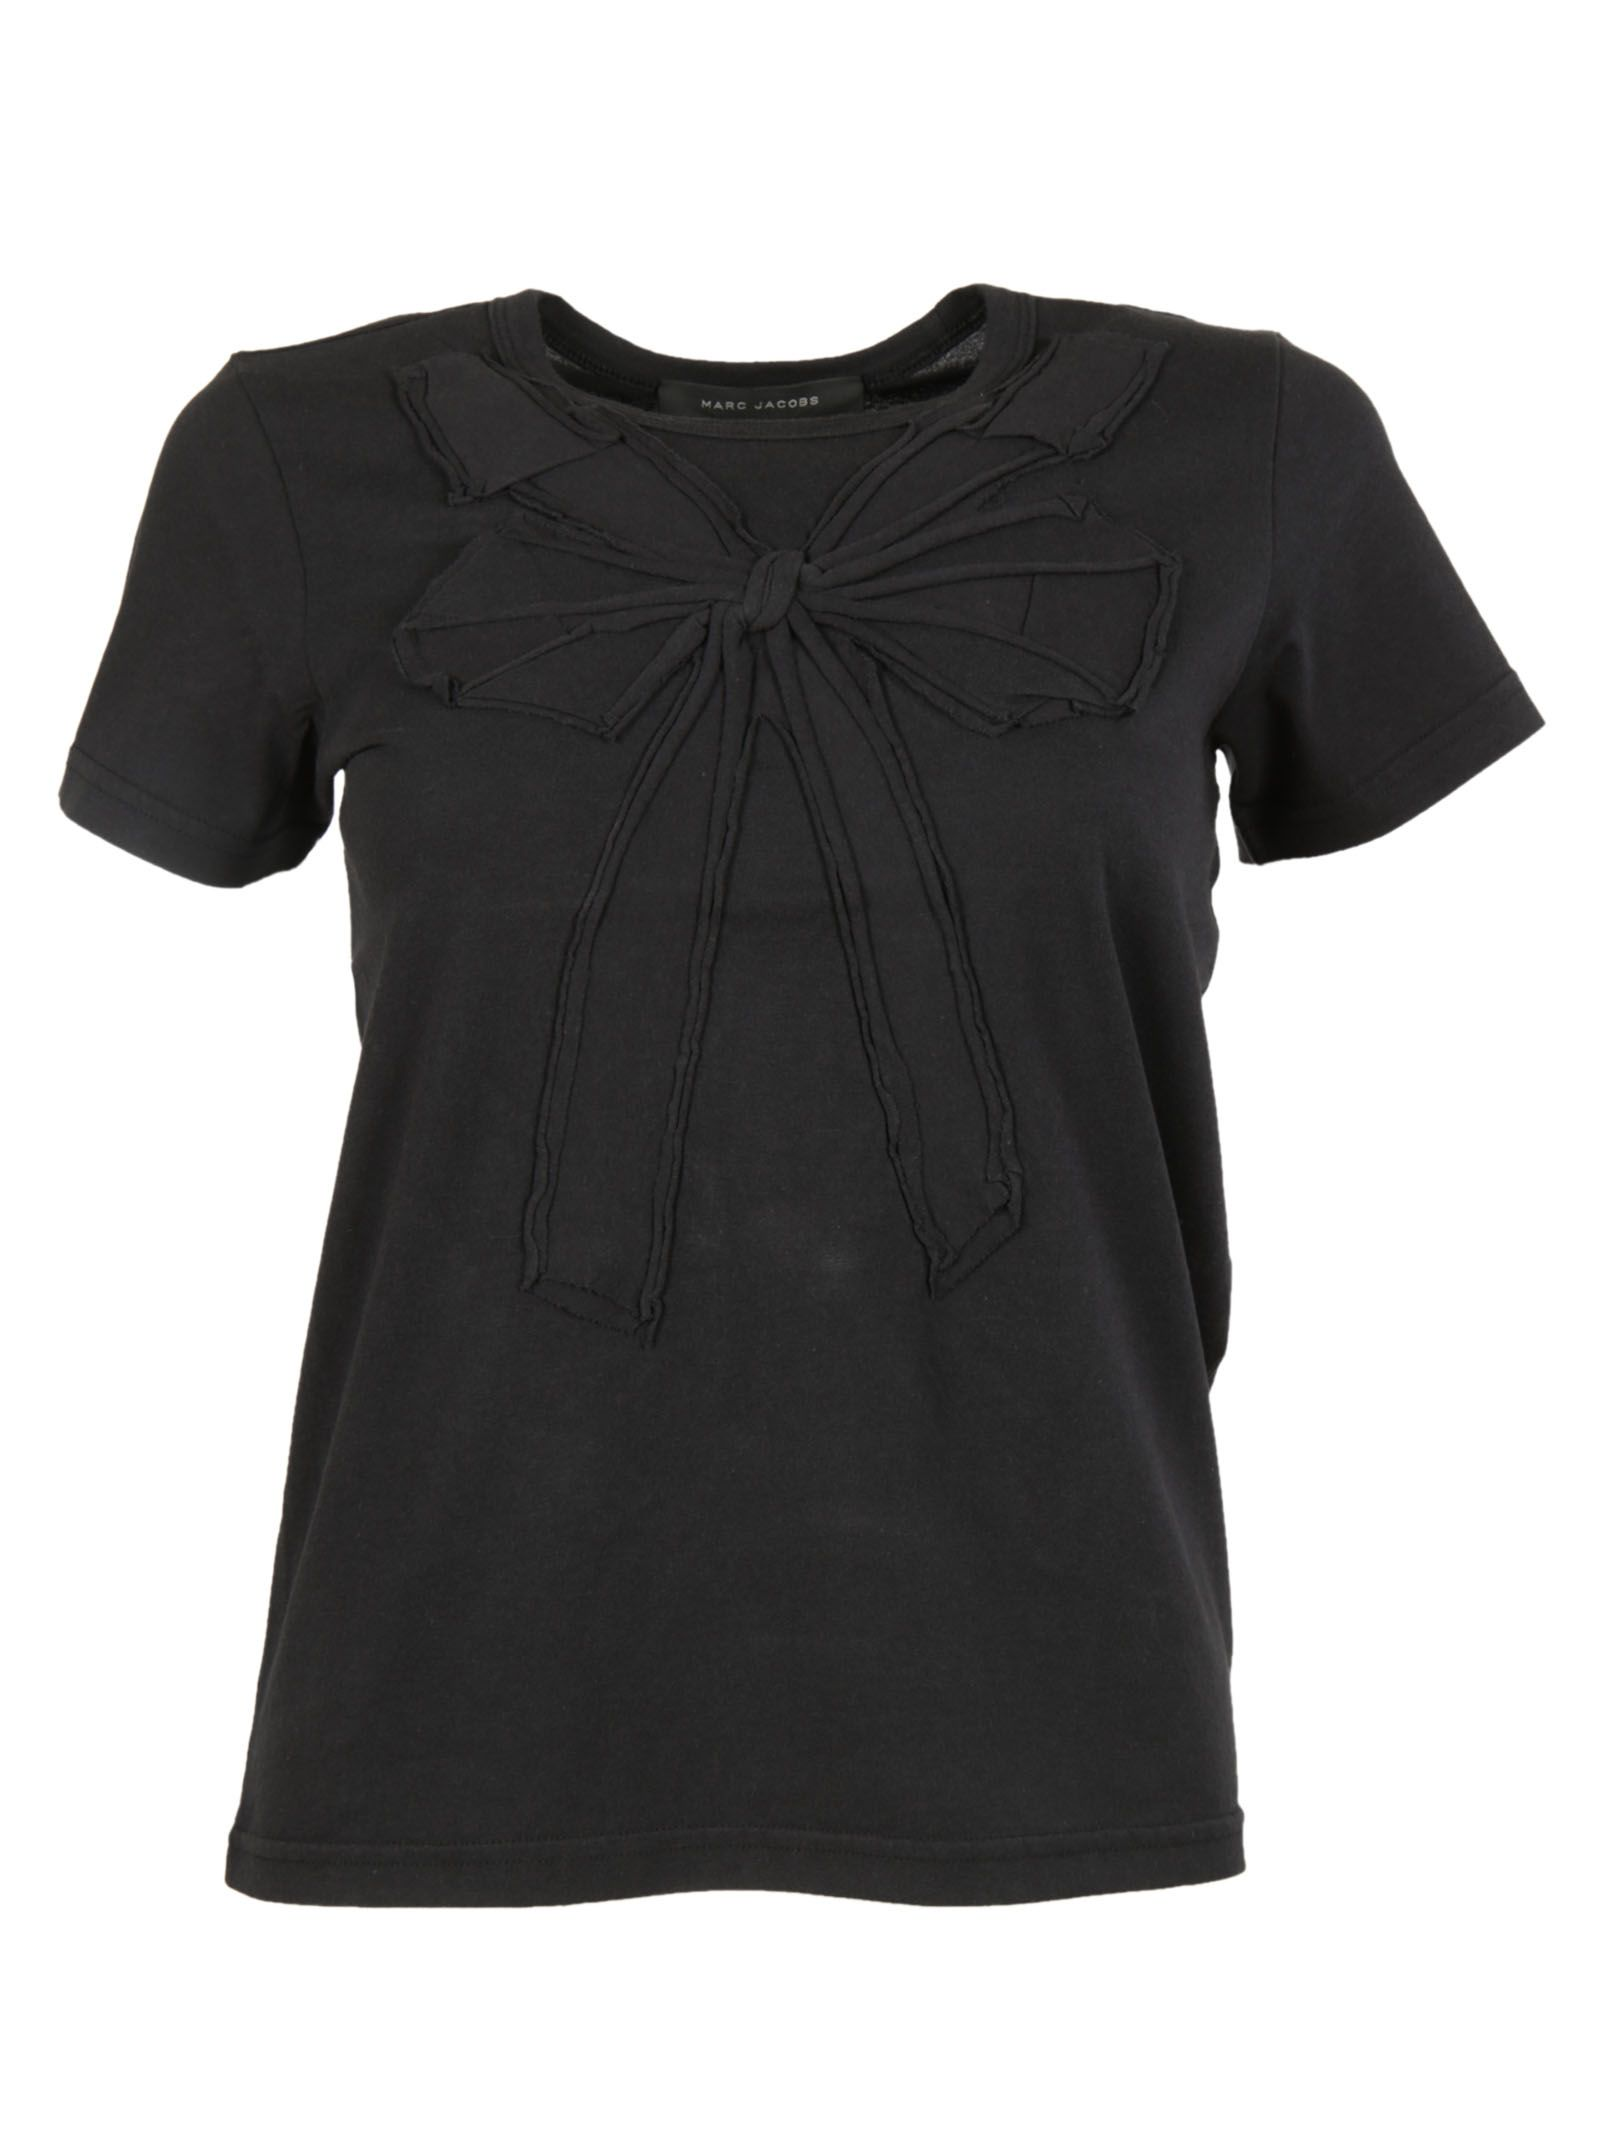 marc jacobs female 188971 black bow embroidery tshirt